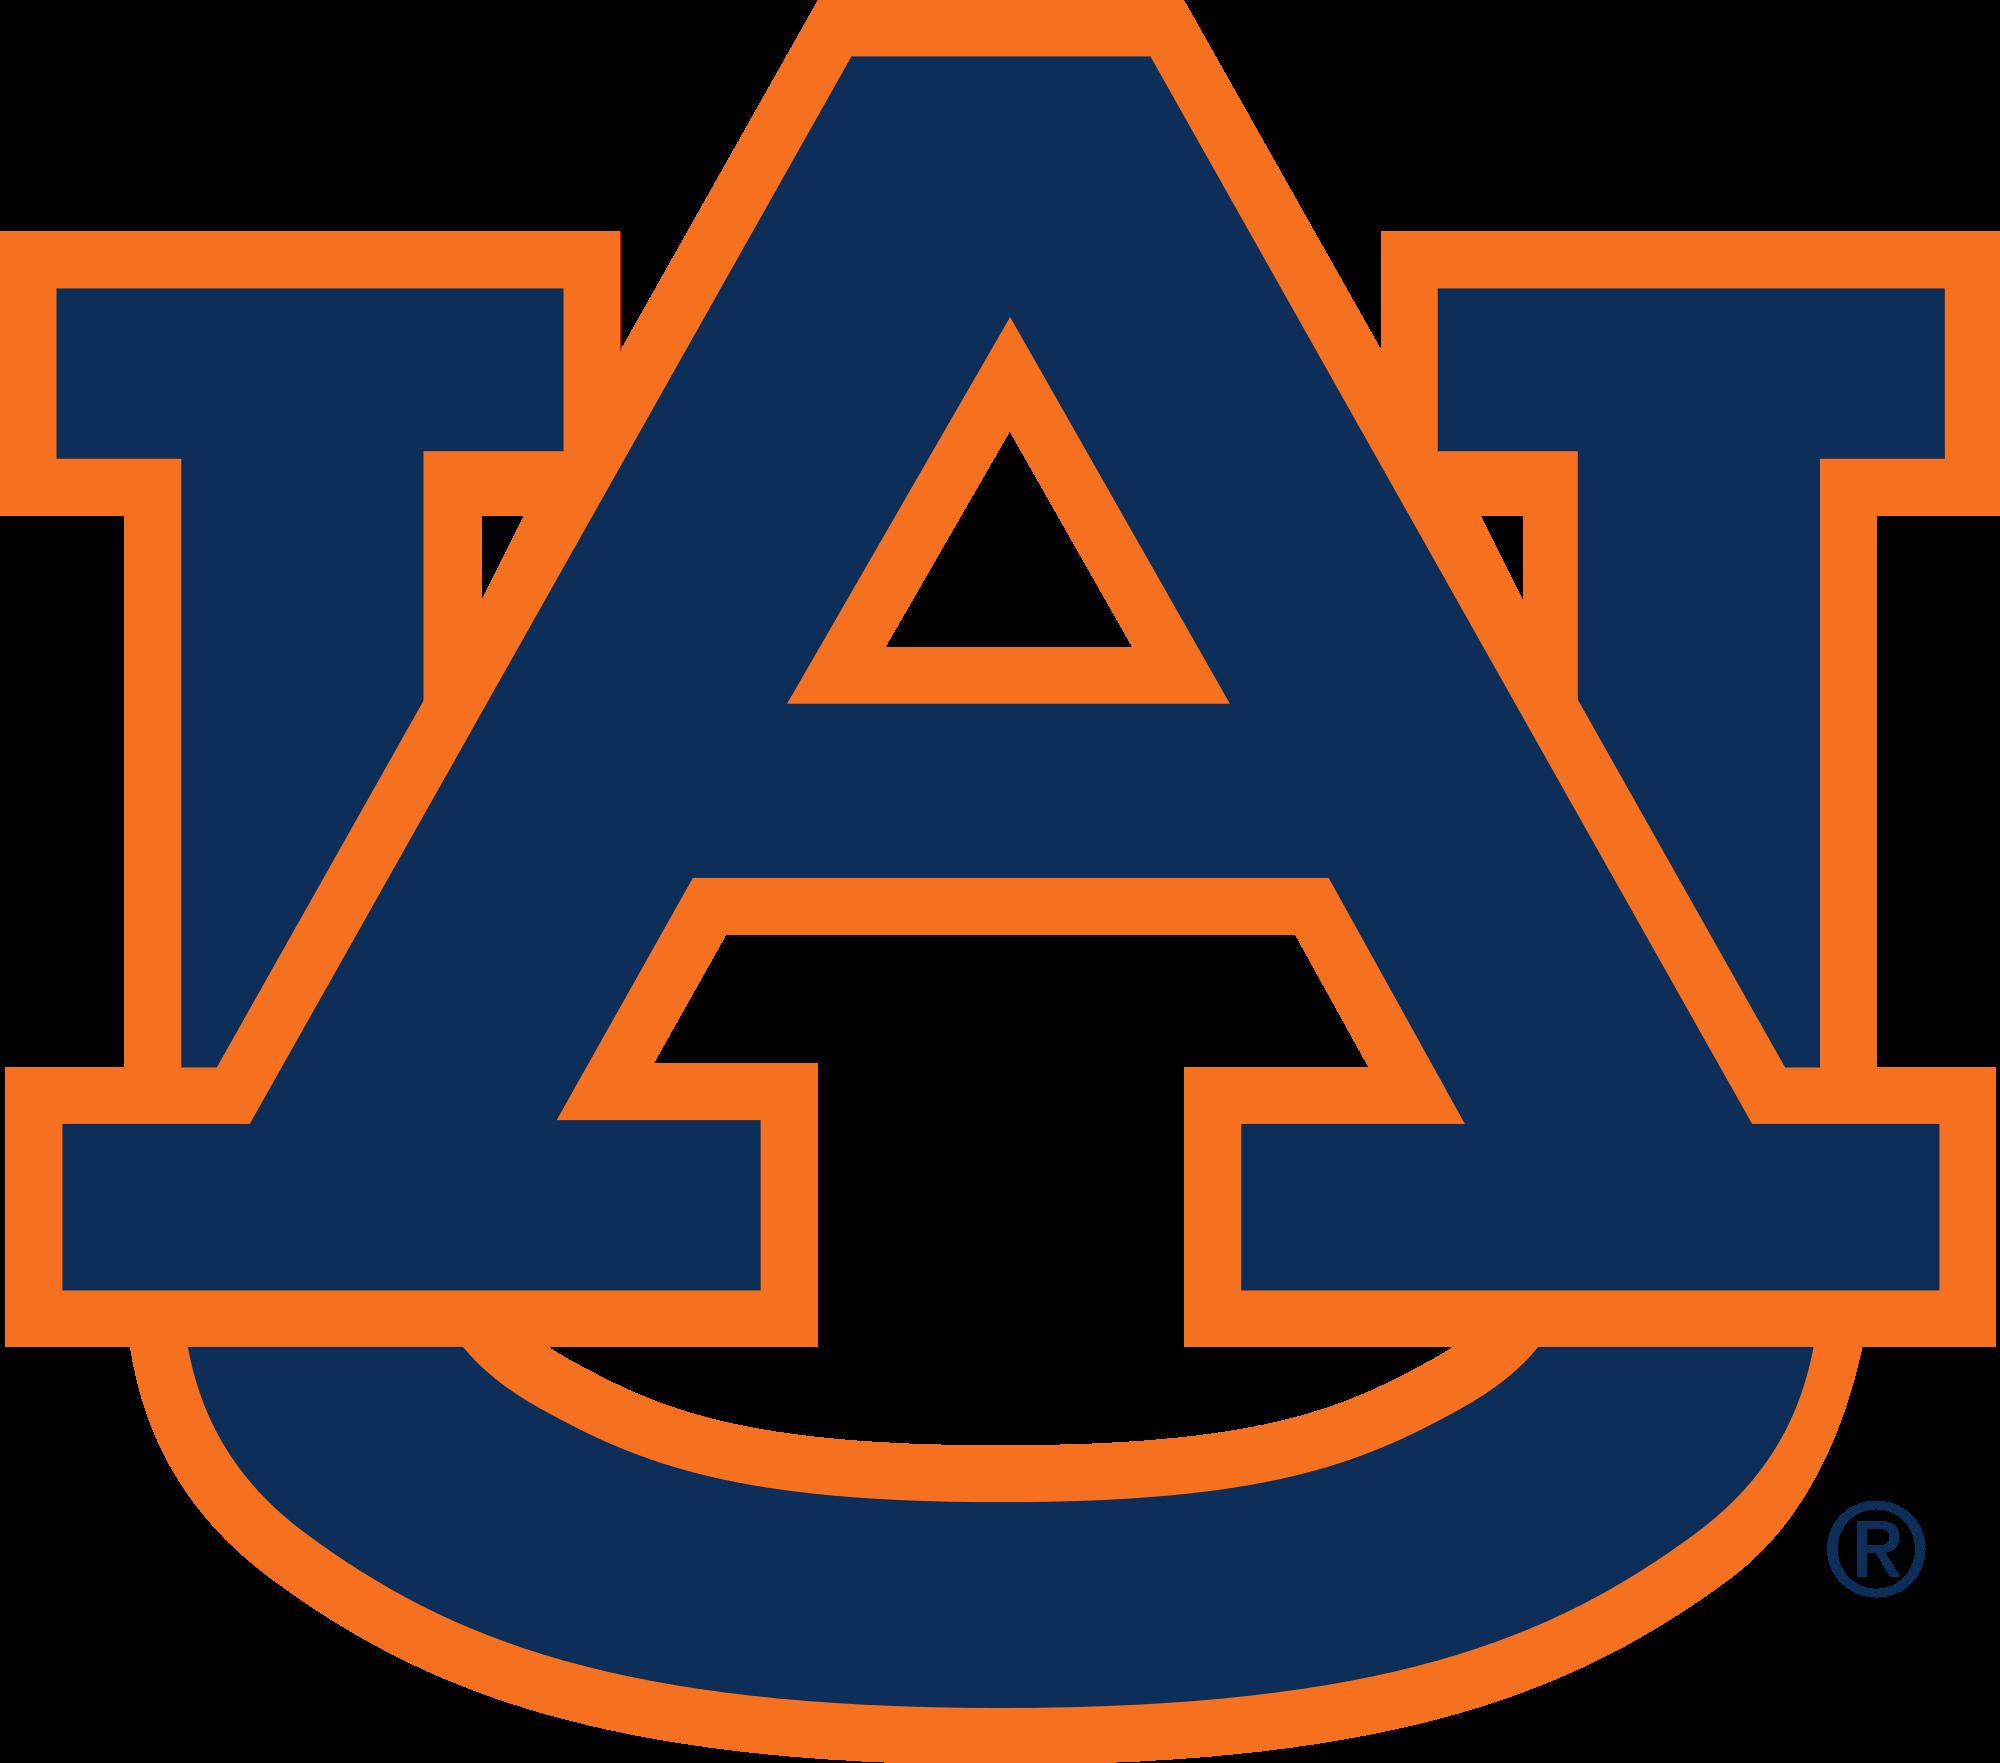 Georgia vs auburn football clipart image transparent library Auburn University logo | Bridesmaid/Groomsmen Gifts | Pinterest ... image transparent library